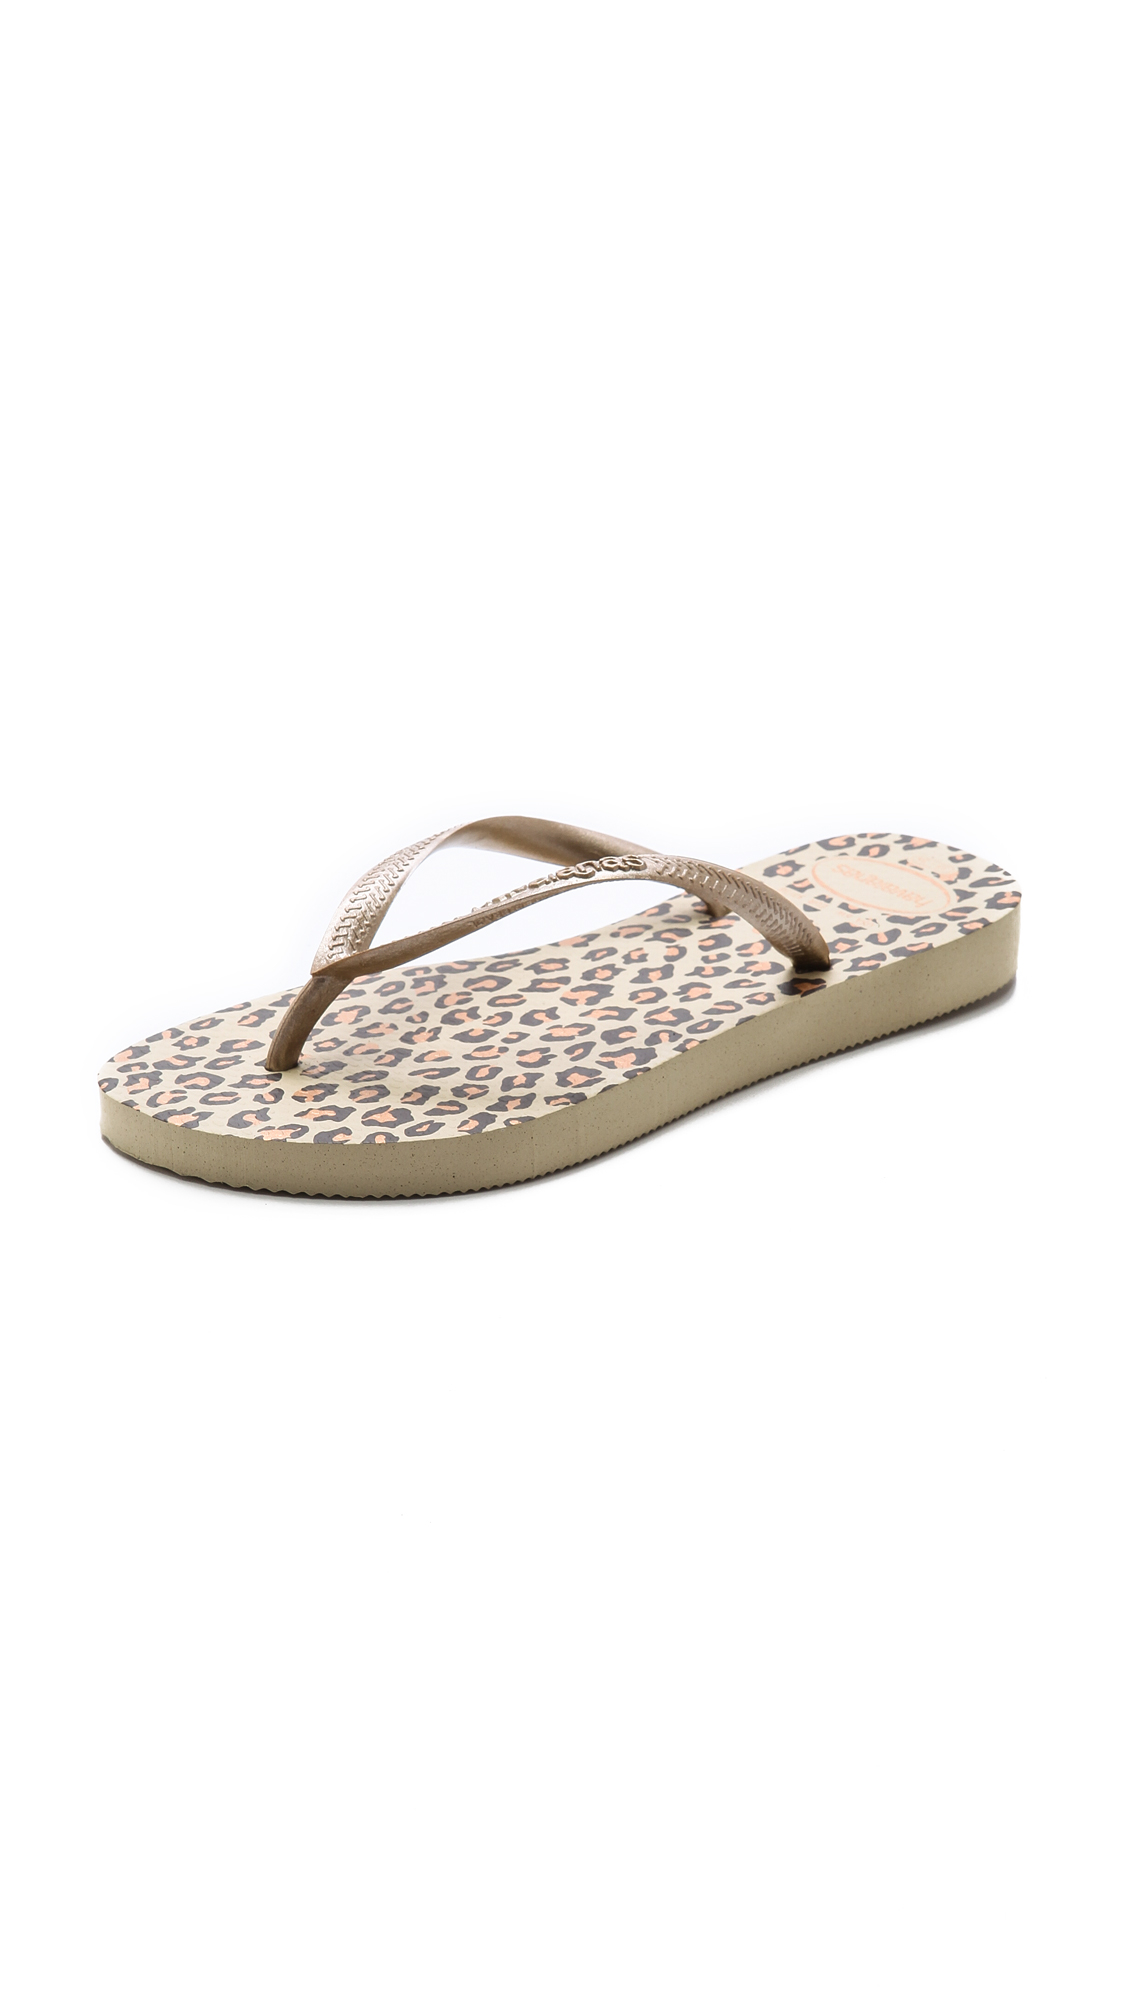 5c76f21bb8ef4 Havaianas Slim Leopard Flip Flops in Natural - Lyst